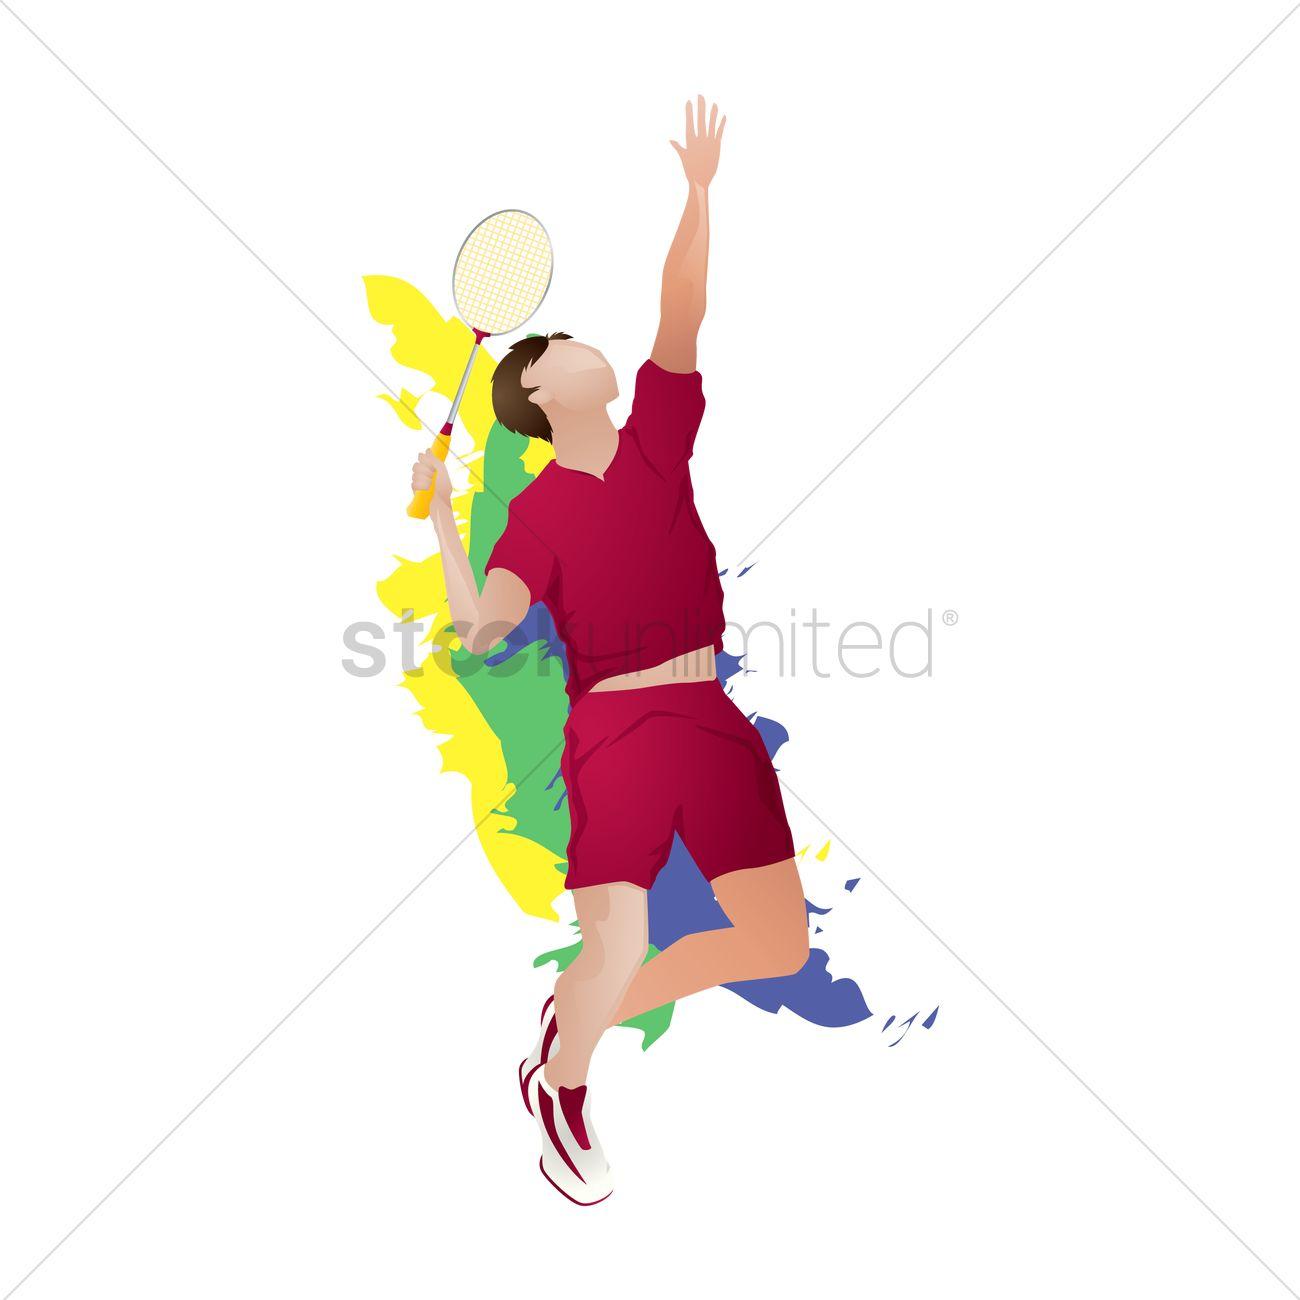 Badminton player png